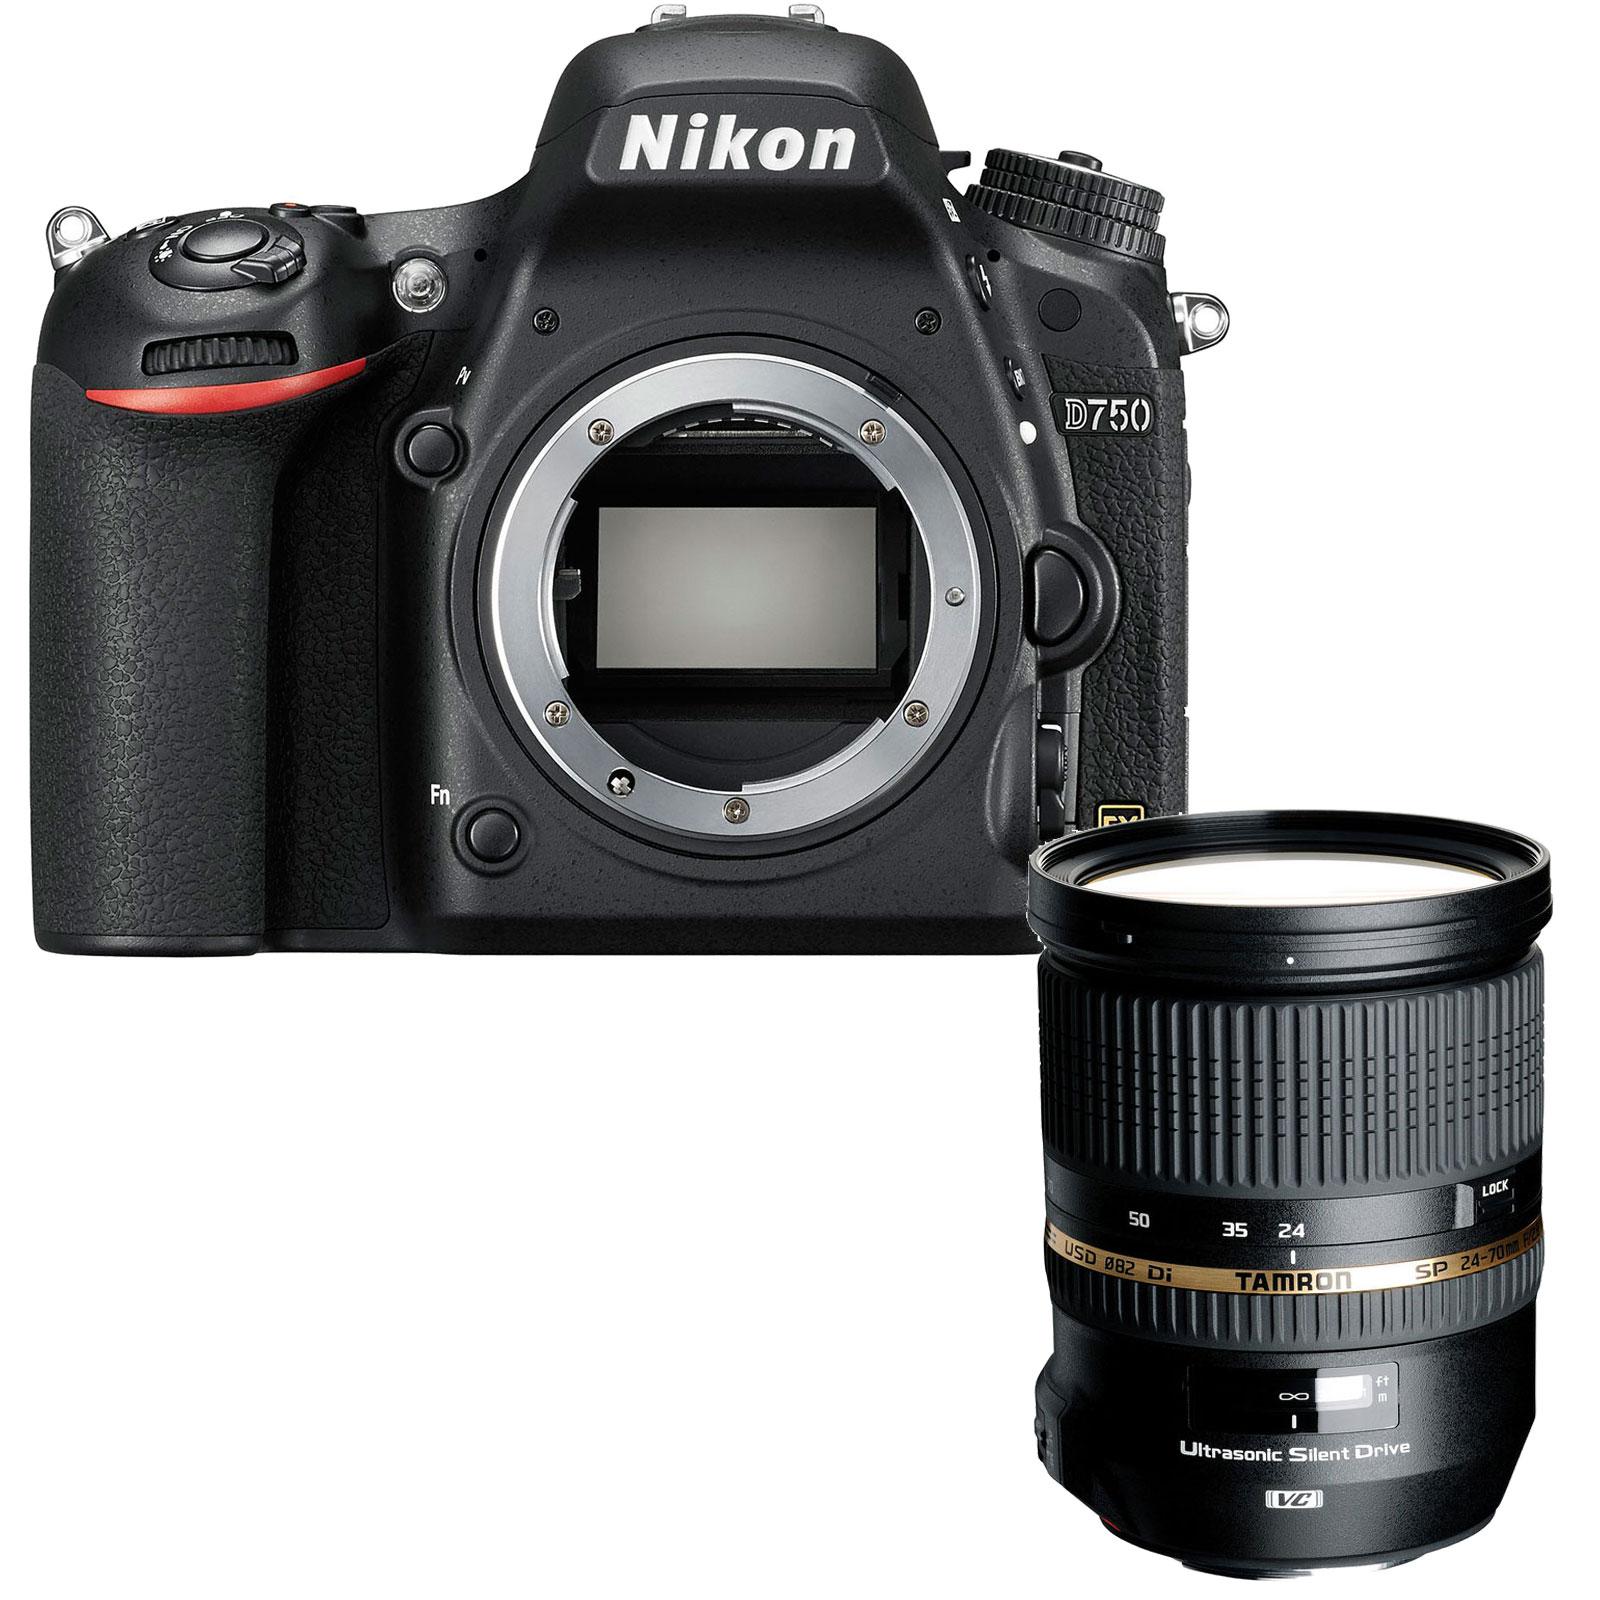 "Appareil photo Reflex Nikon D750 + Tamron SP 24-70 mm F/2,8 Di VC USD Réflex Numérique 24.3 MP - Ecran inclinable 3.2"" - Vidéo Full HD 1080p - Wi-Fi + Objectif"